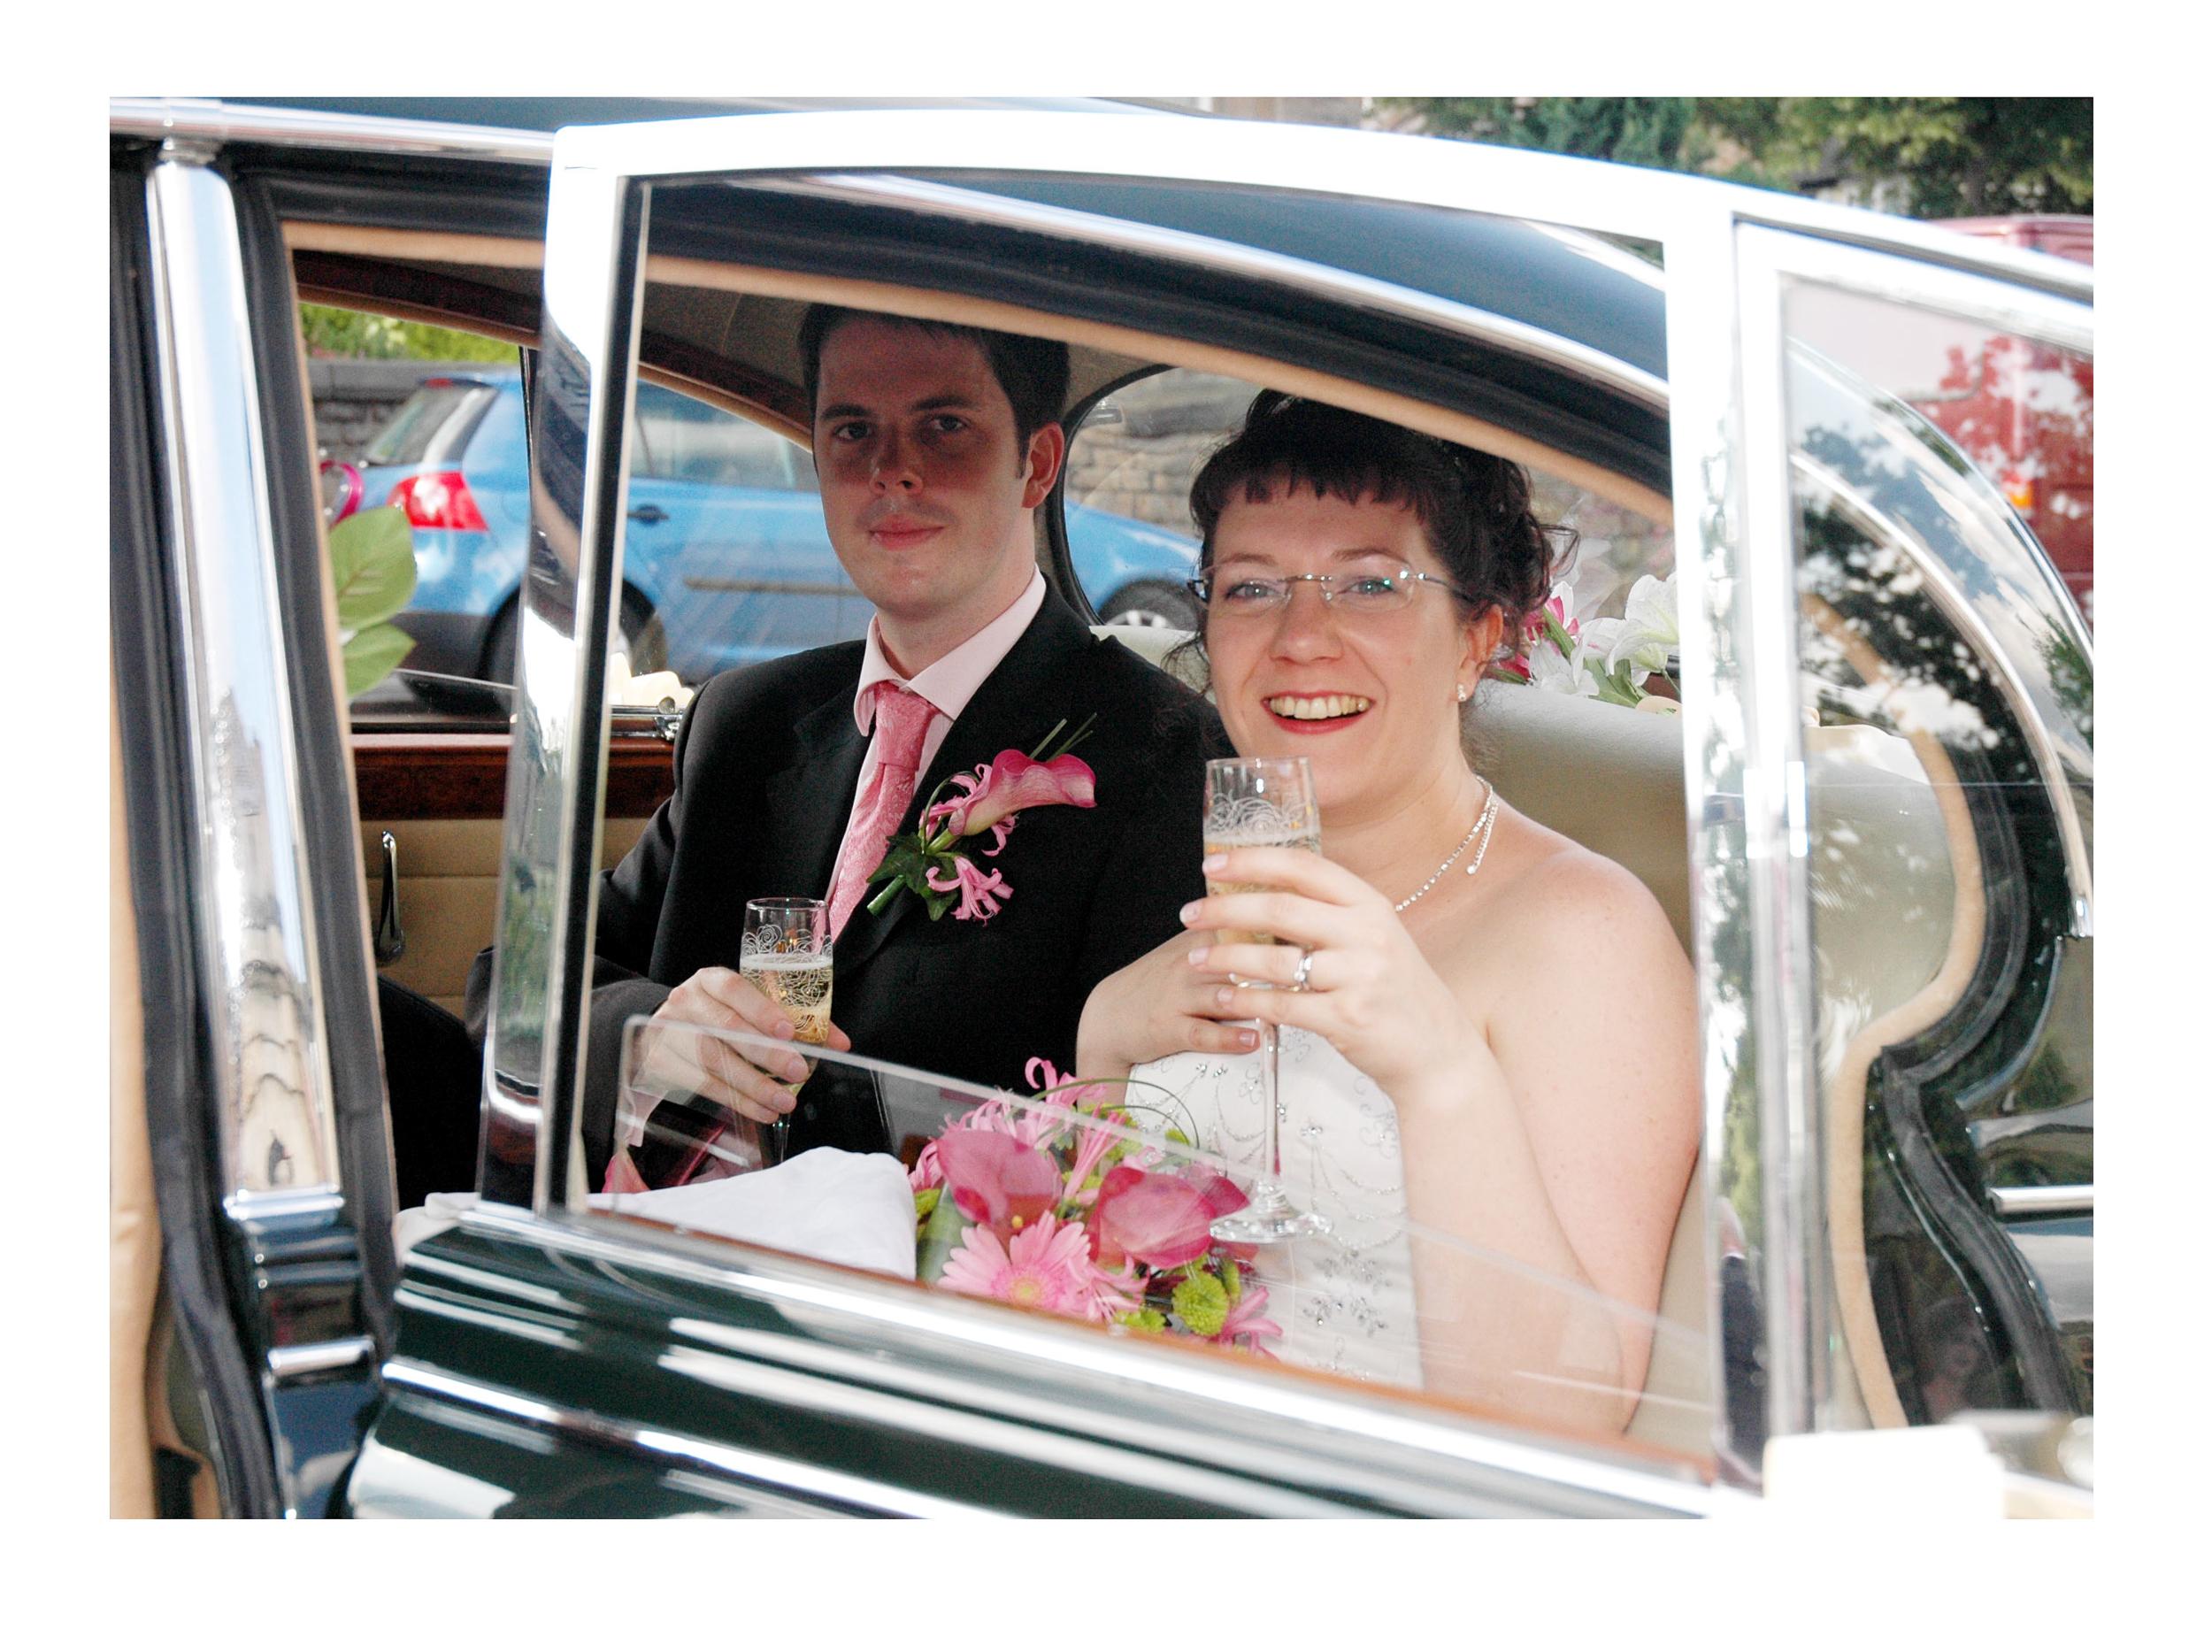 REPORTAGE-WEDDING-PHOTOGRAPHY-SET-UK-39.jpg